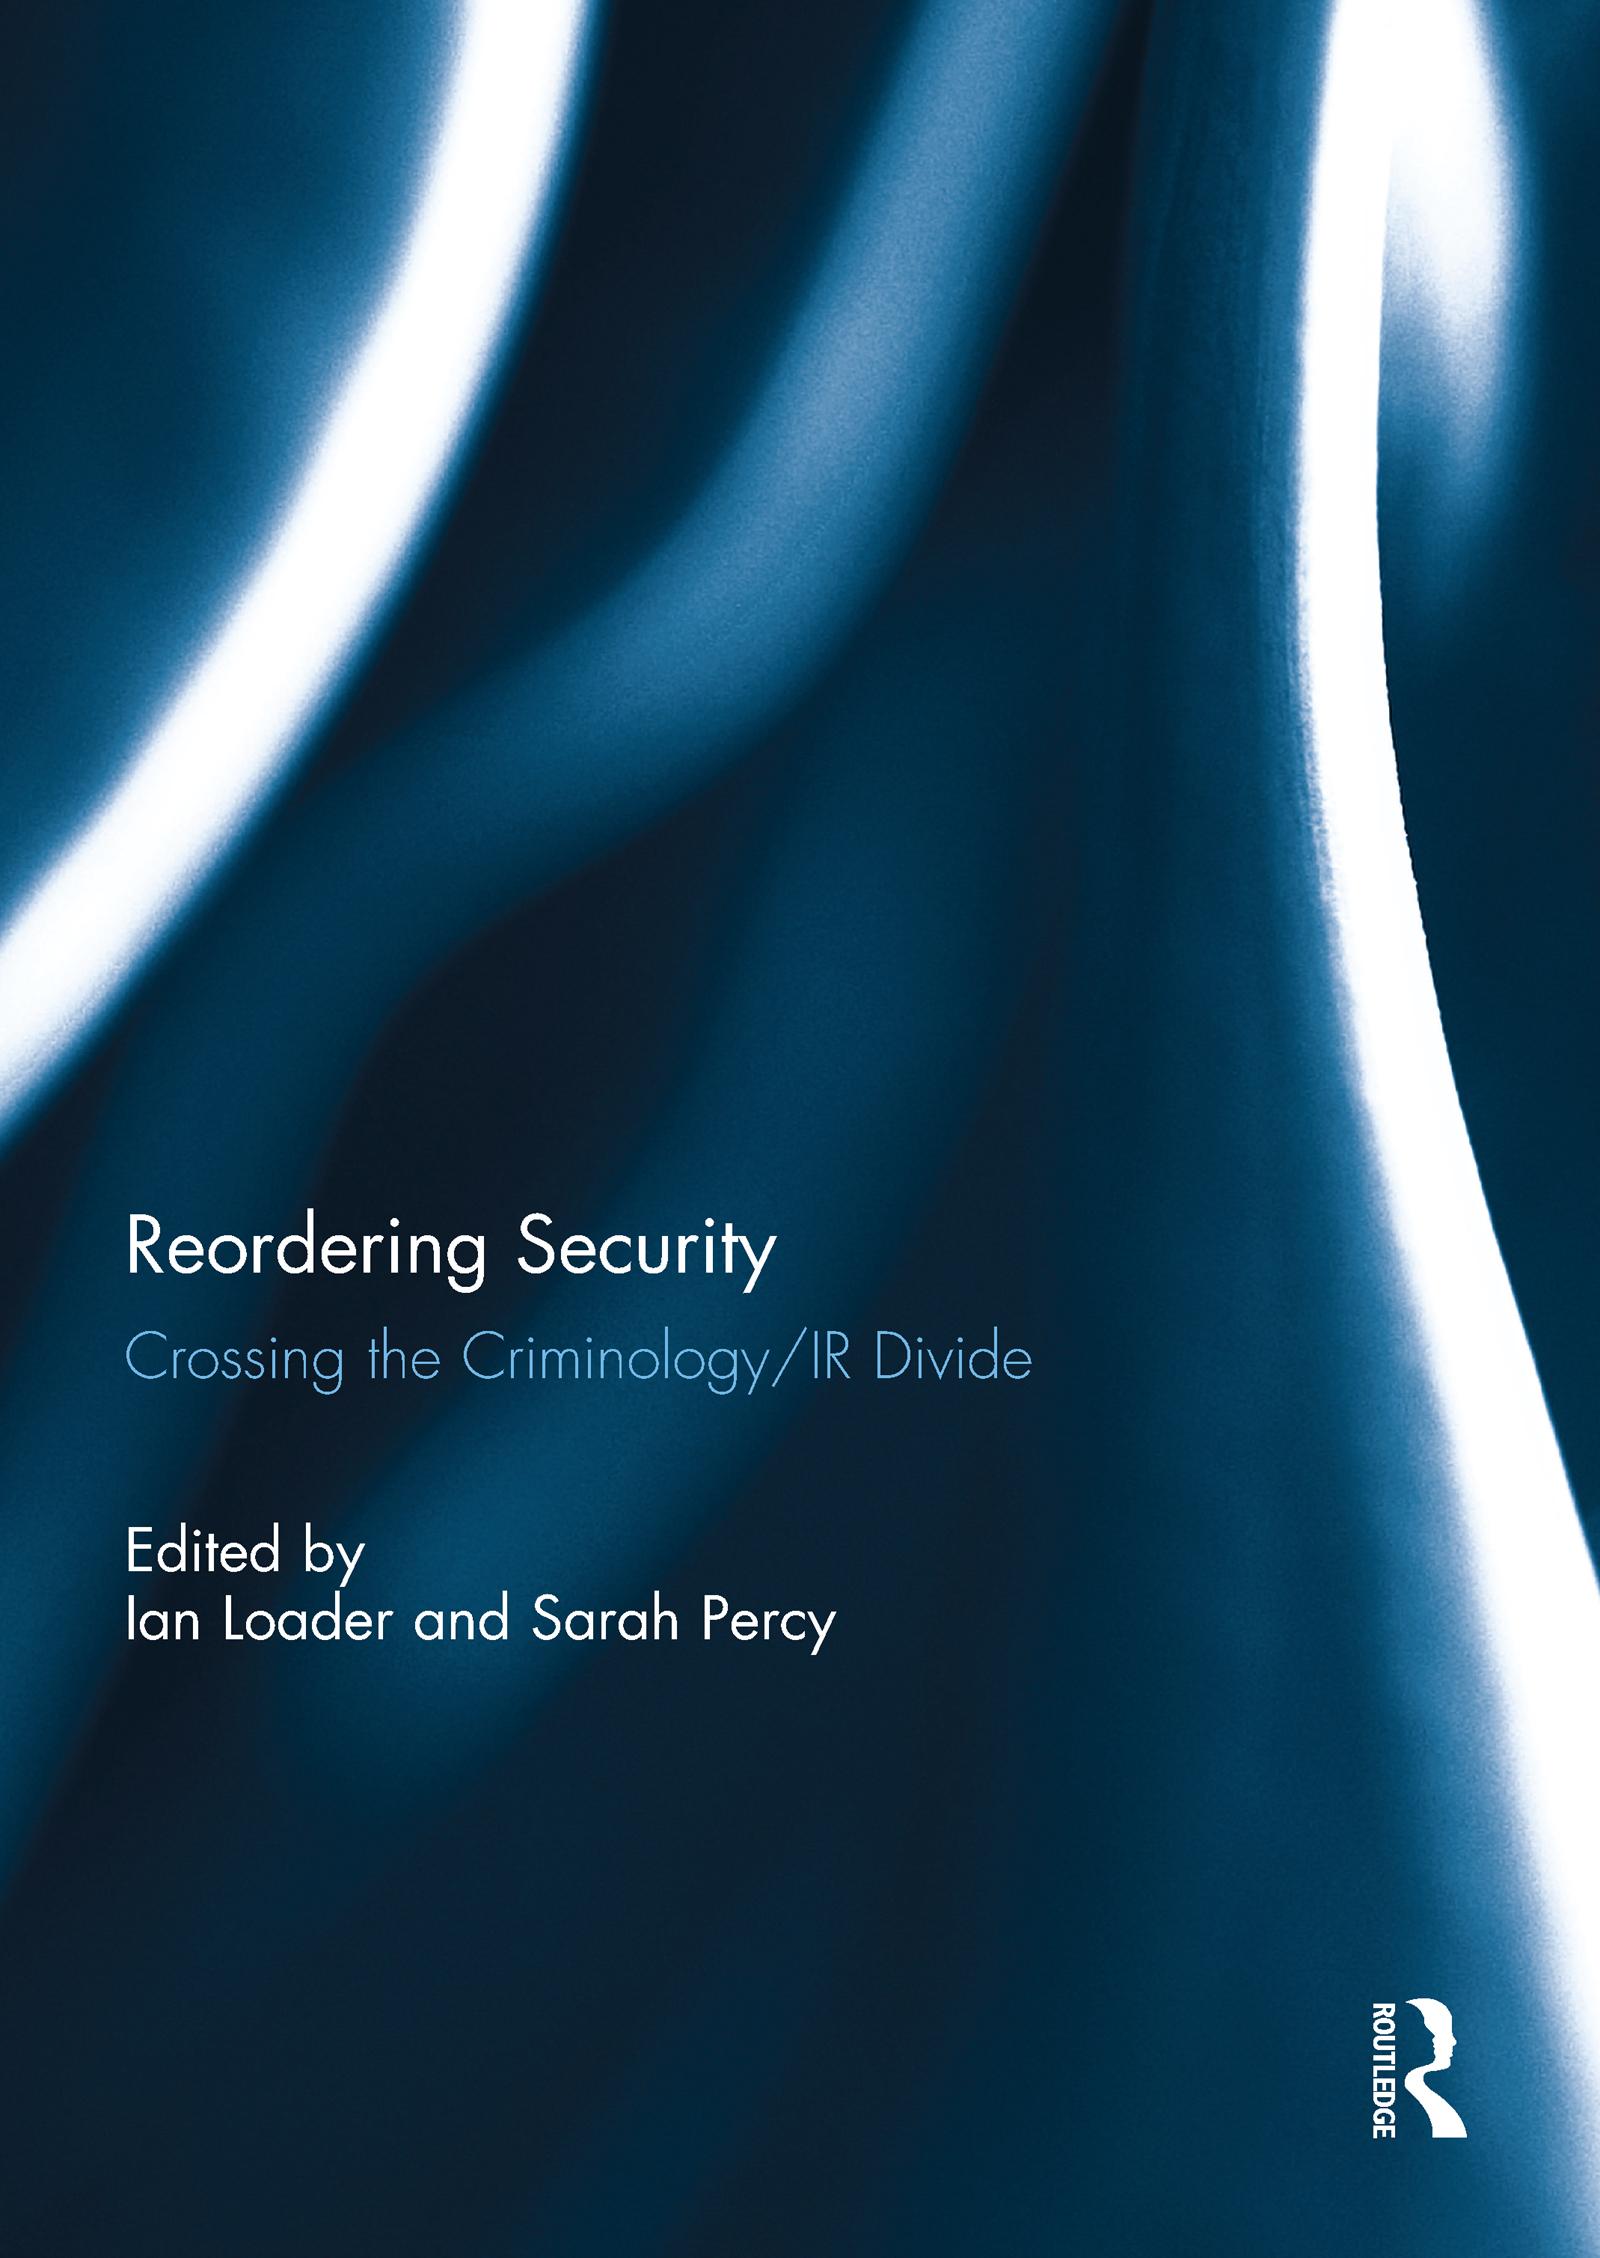 Reordering Security